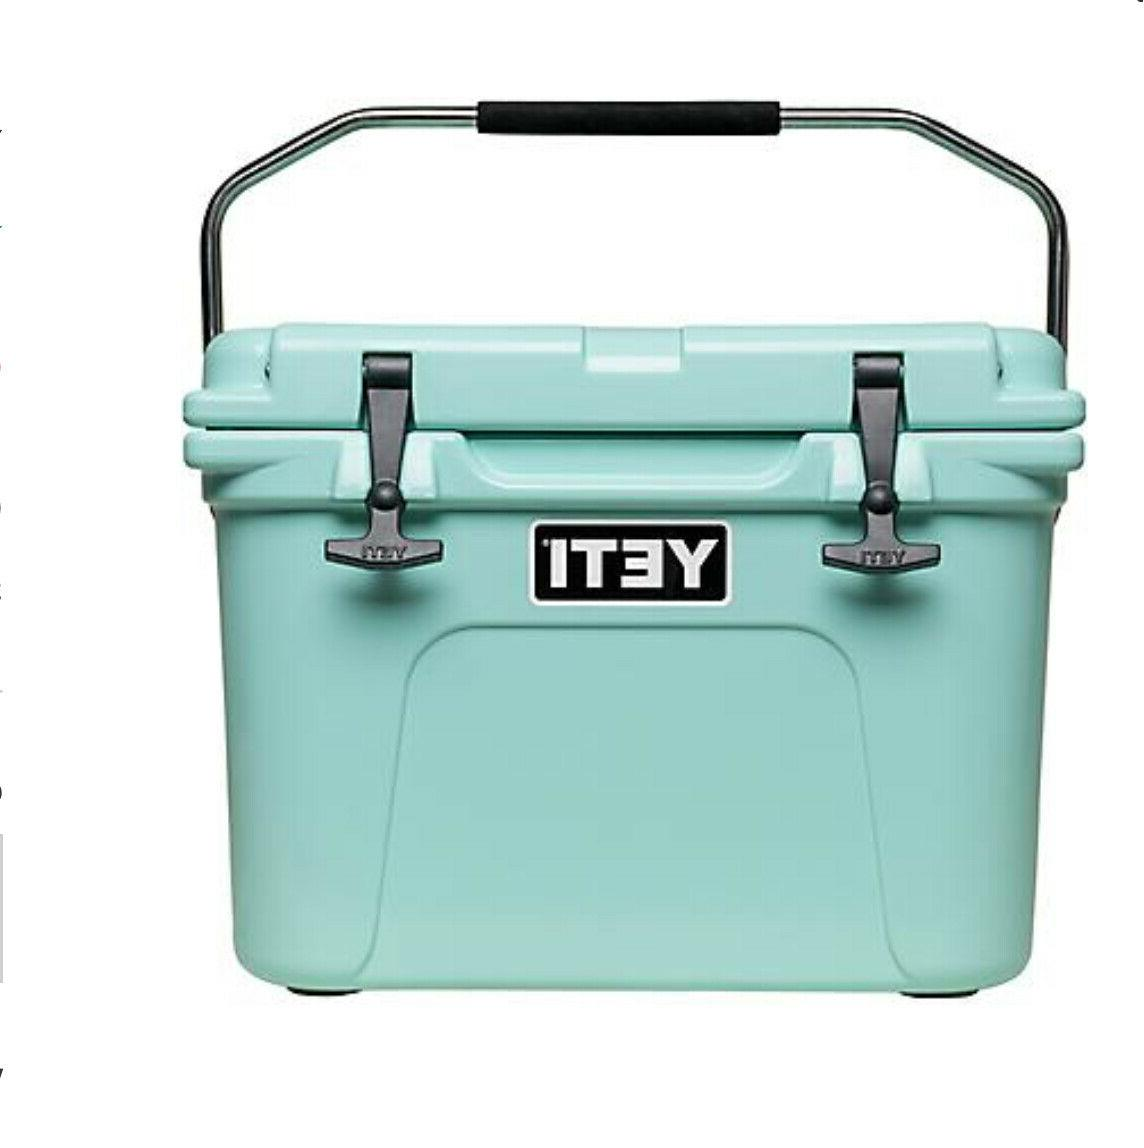 Yeti Roadie 20 20qt Cooler Seafoam Limited Edition